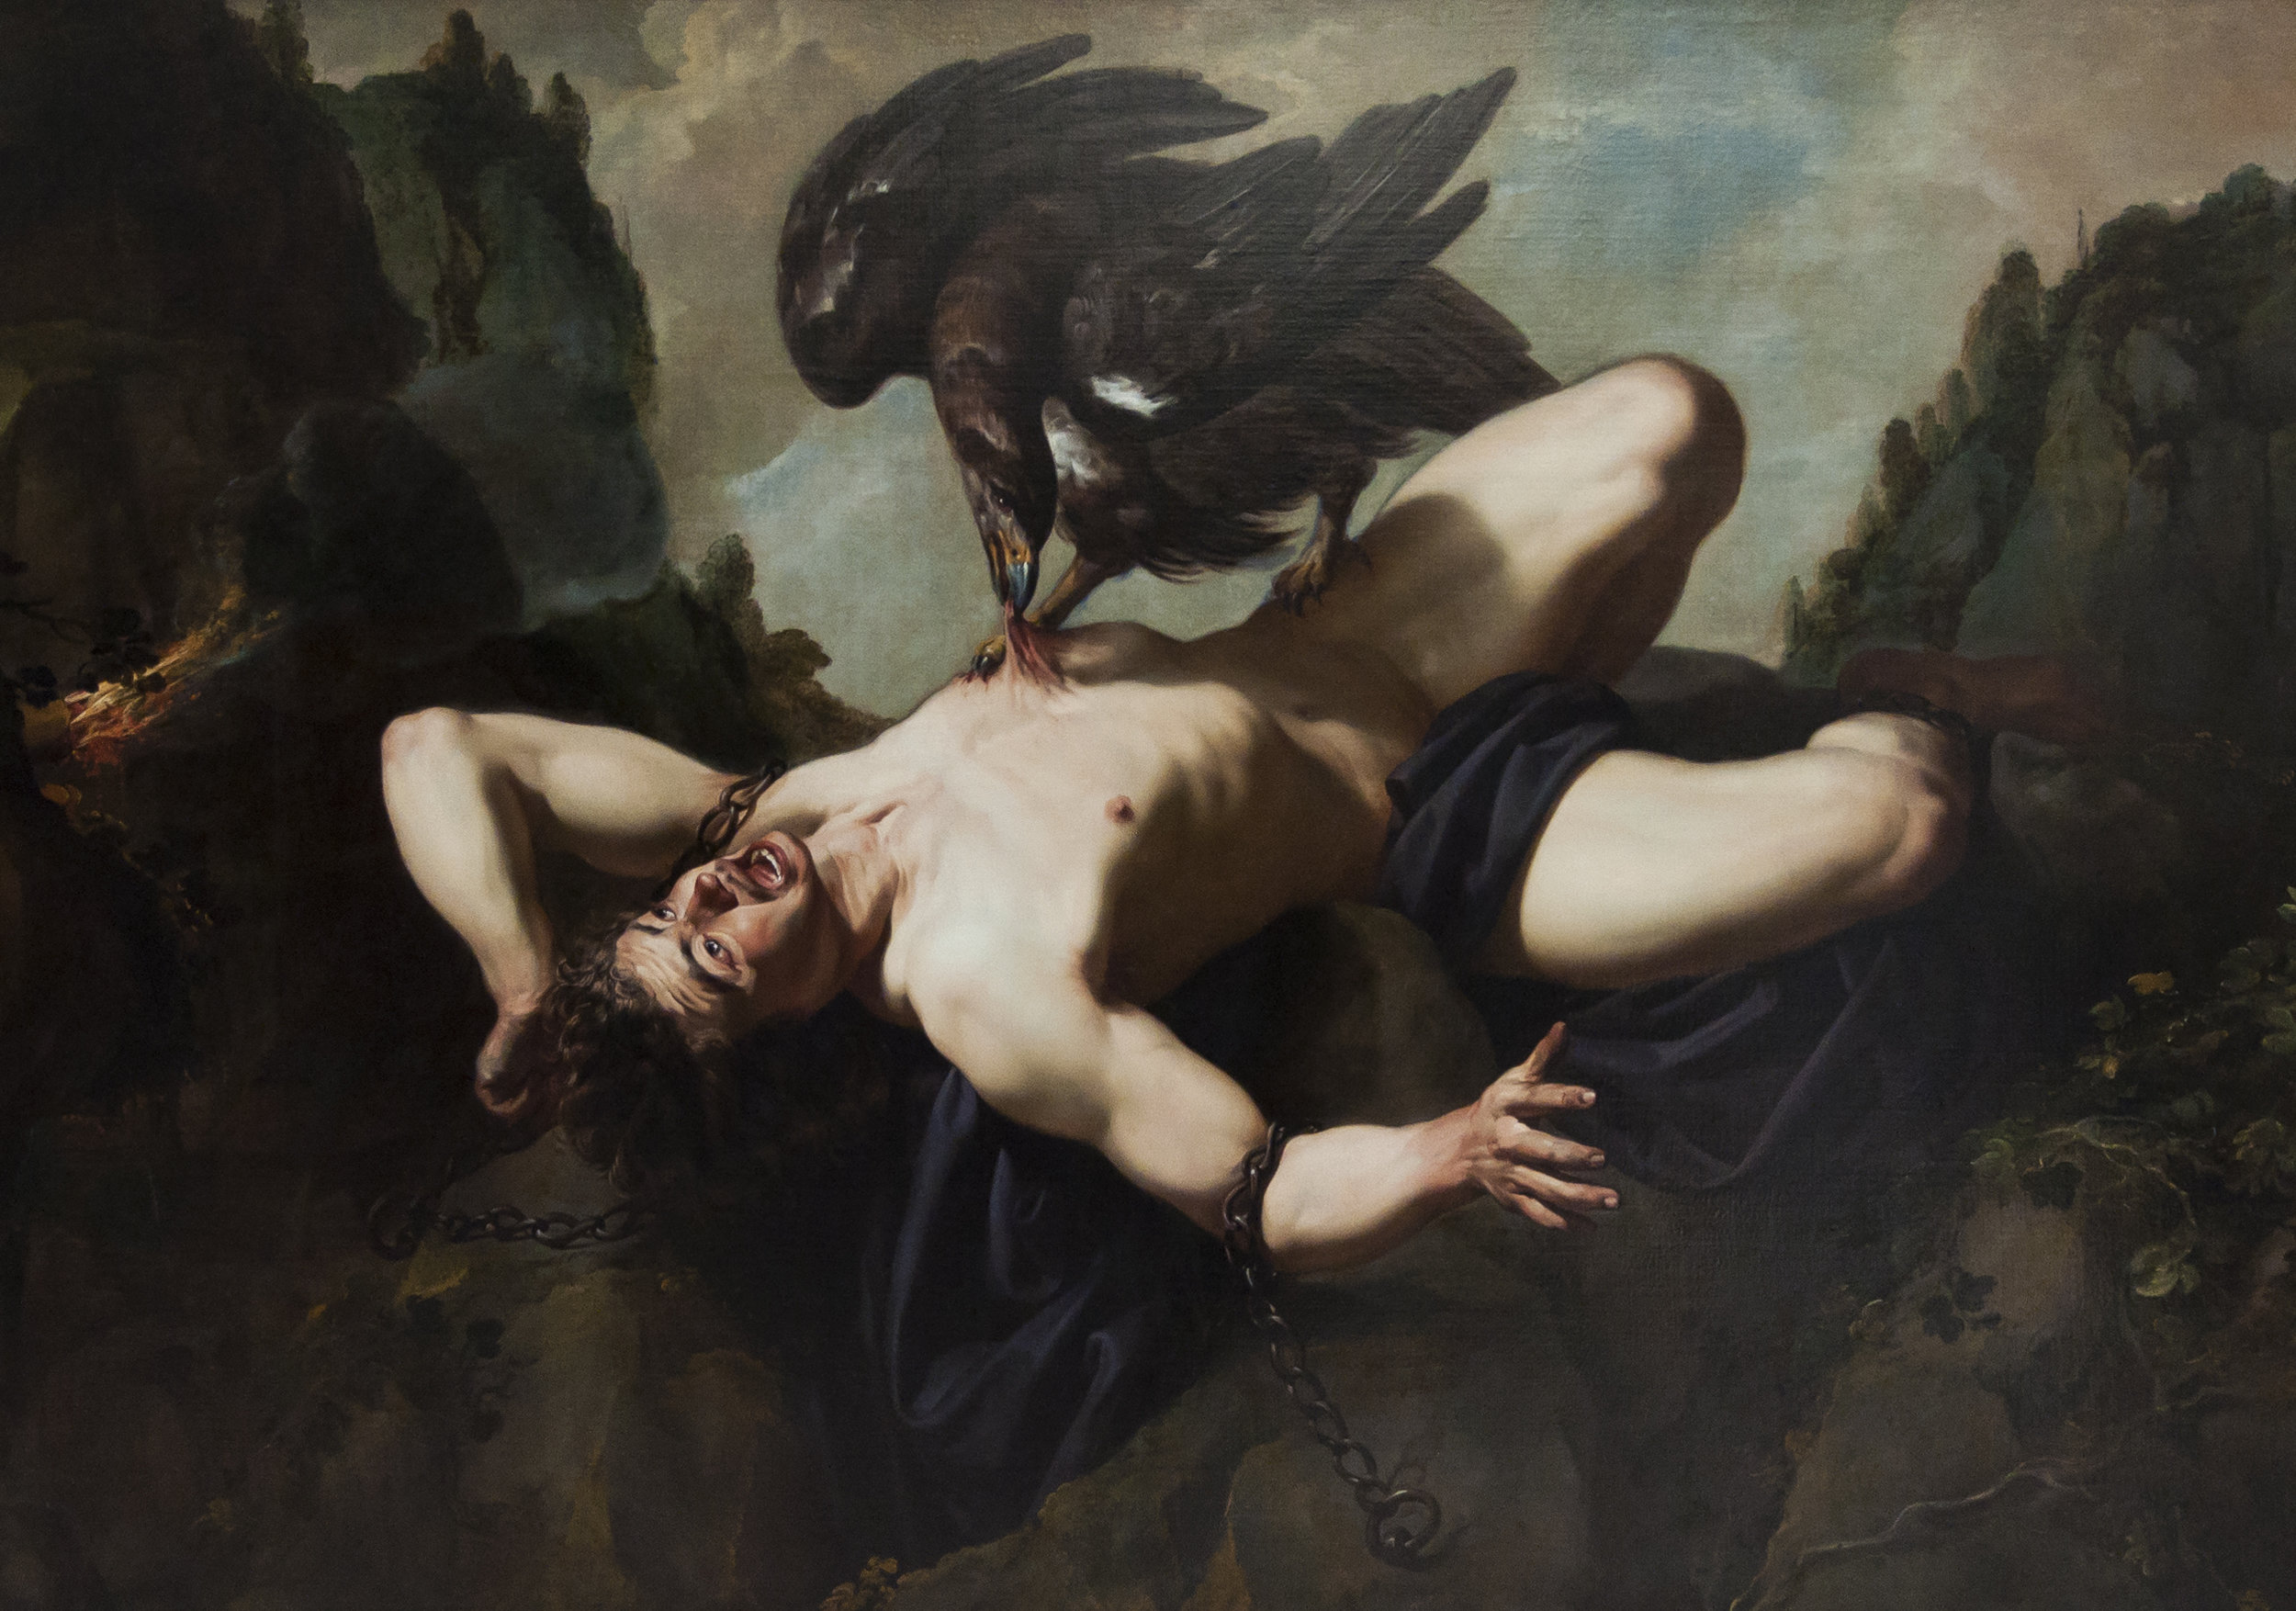 Theodoor_Rombouts_(1597-1637)_-_Prometheus_-_KMSK_Brussel_25-02-2011_12-45-49.jpg